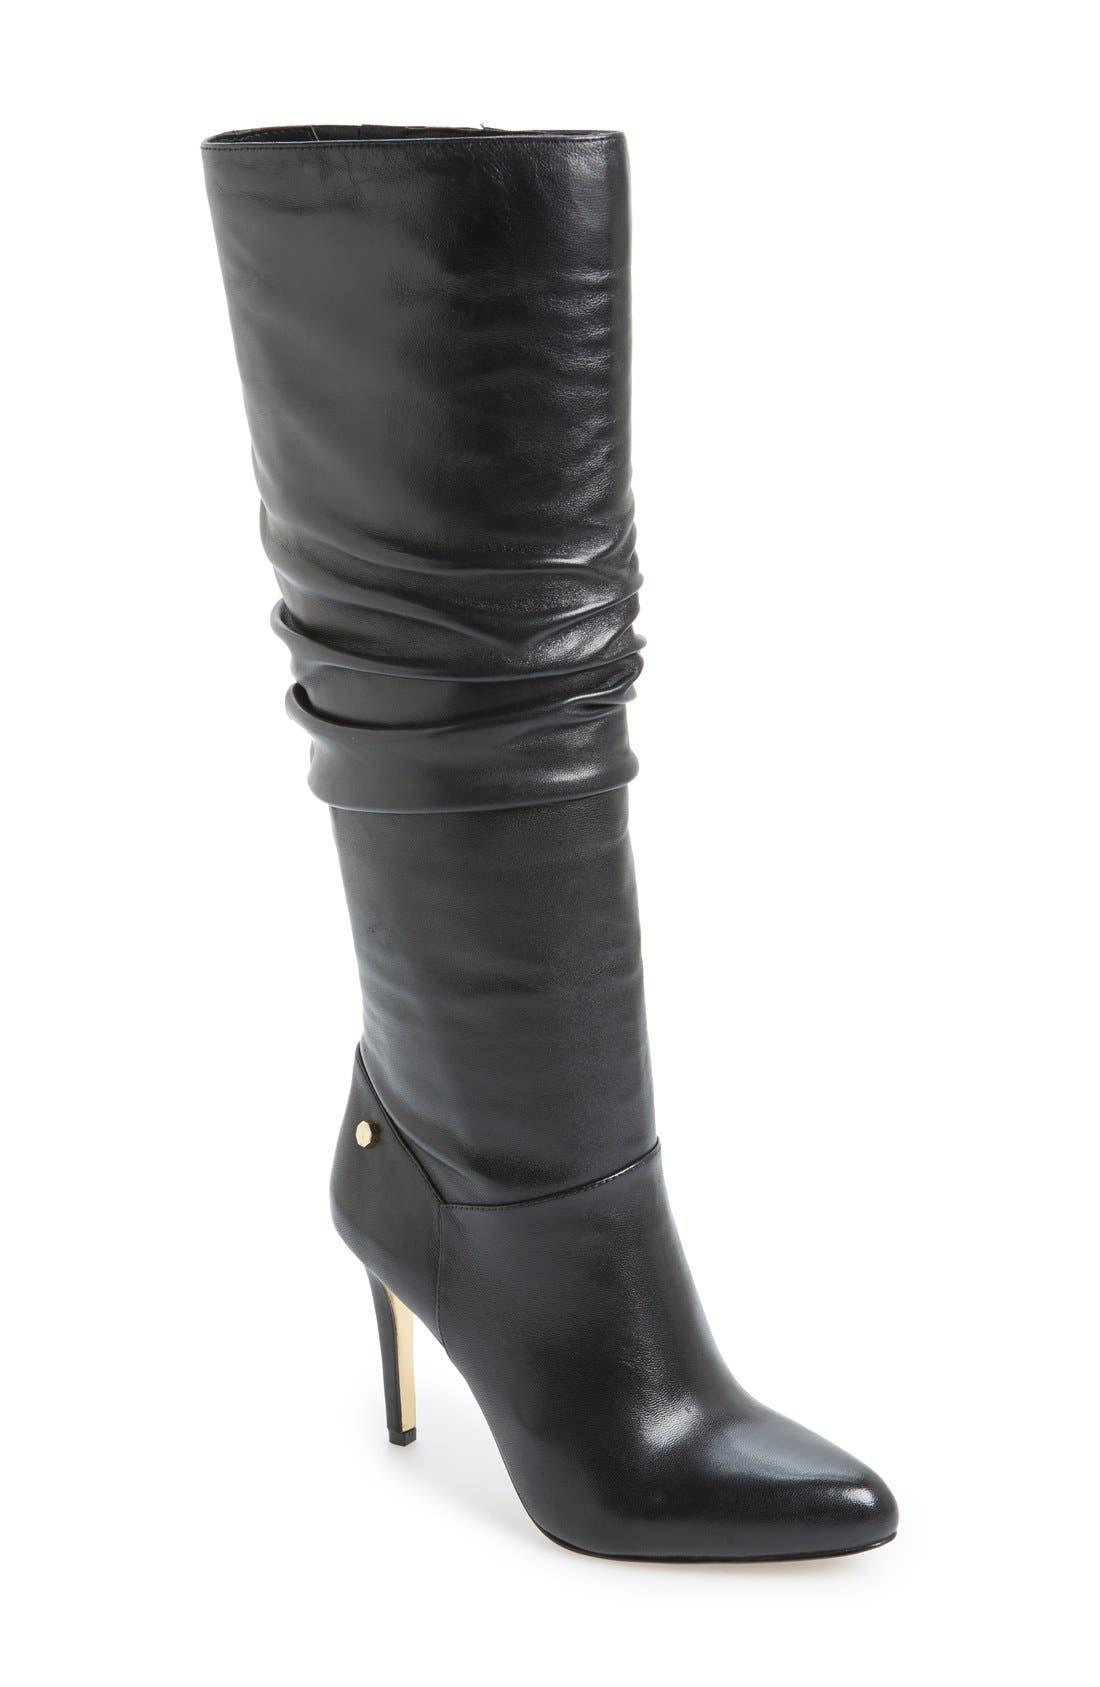 LOUISE ET CIE 'Sallie' Tall Boot, Main, color, 001